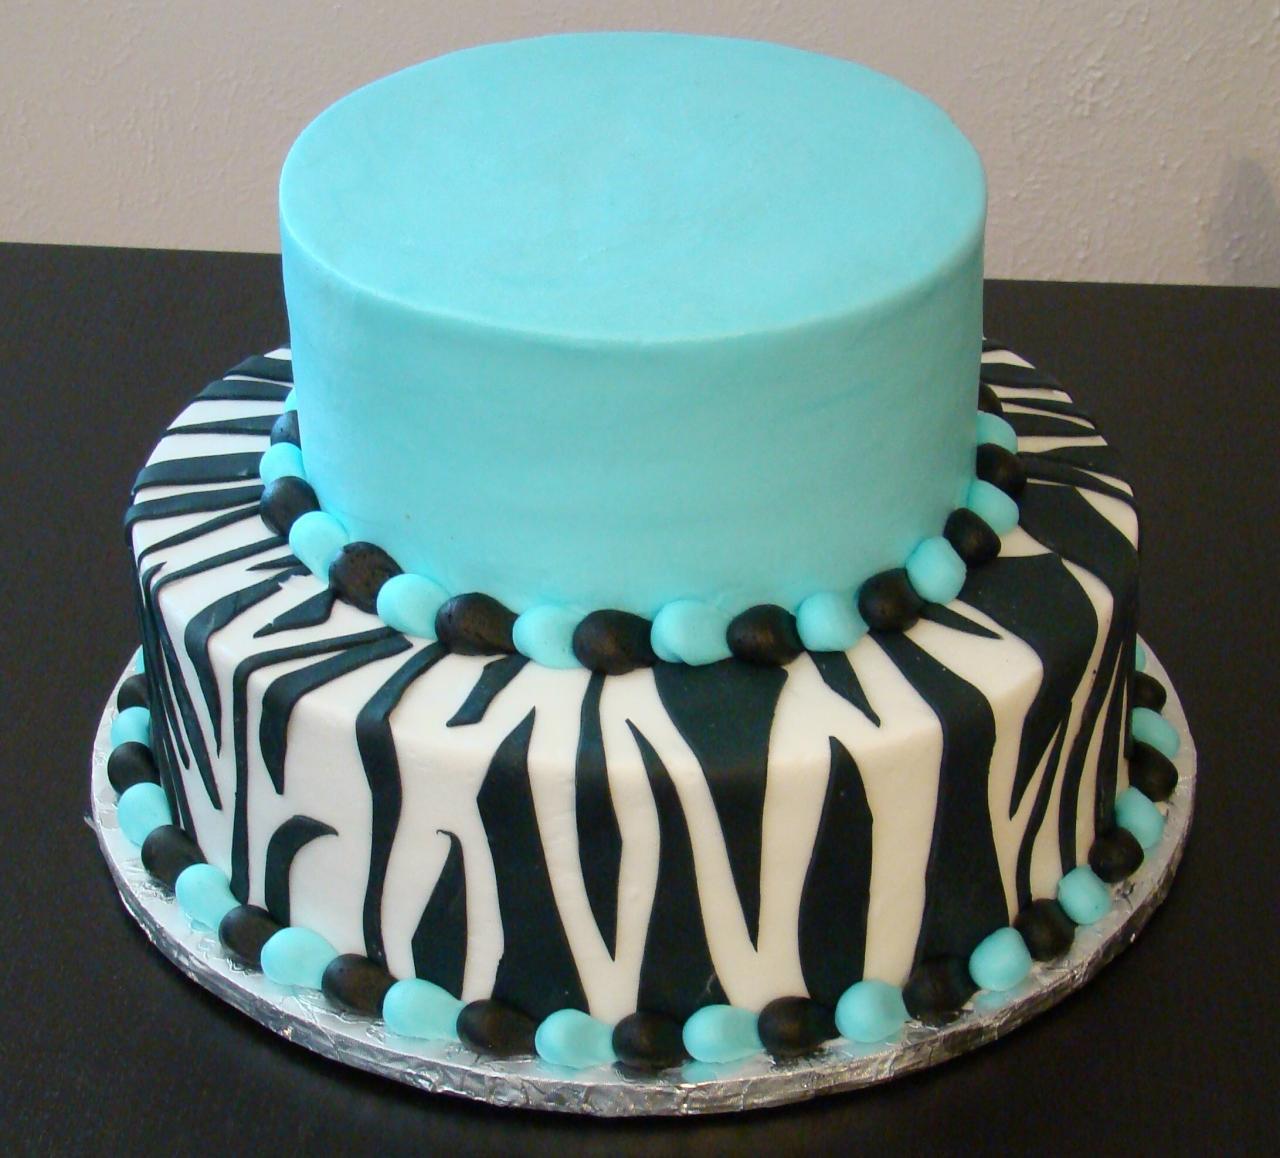 10 Blue Zebra Print Birthday Cakes Photo Blue Zebra Print Birthday